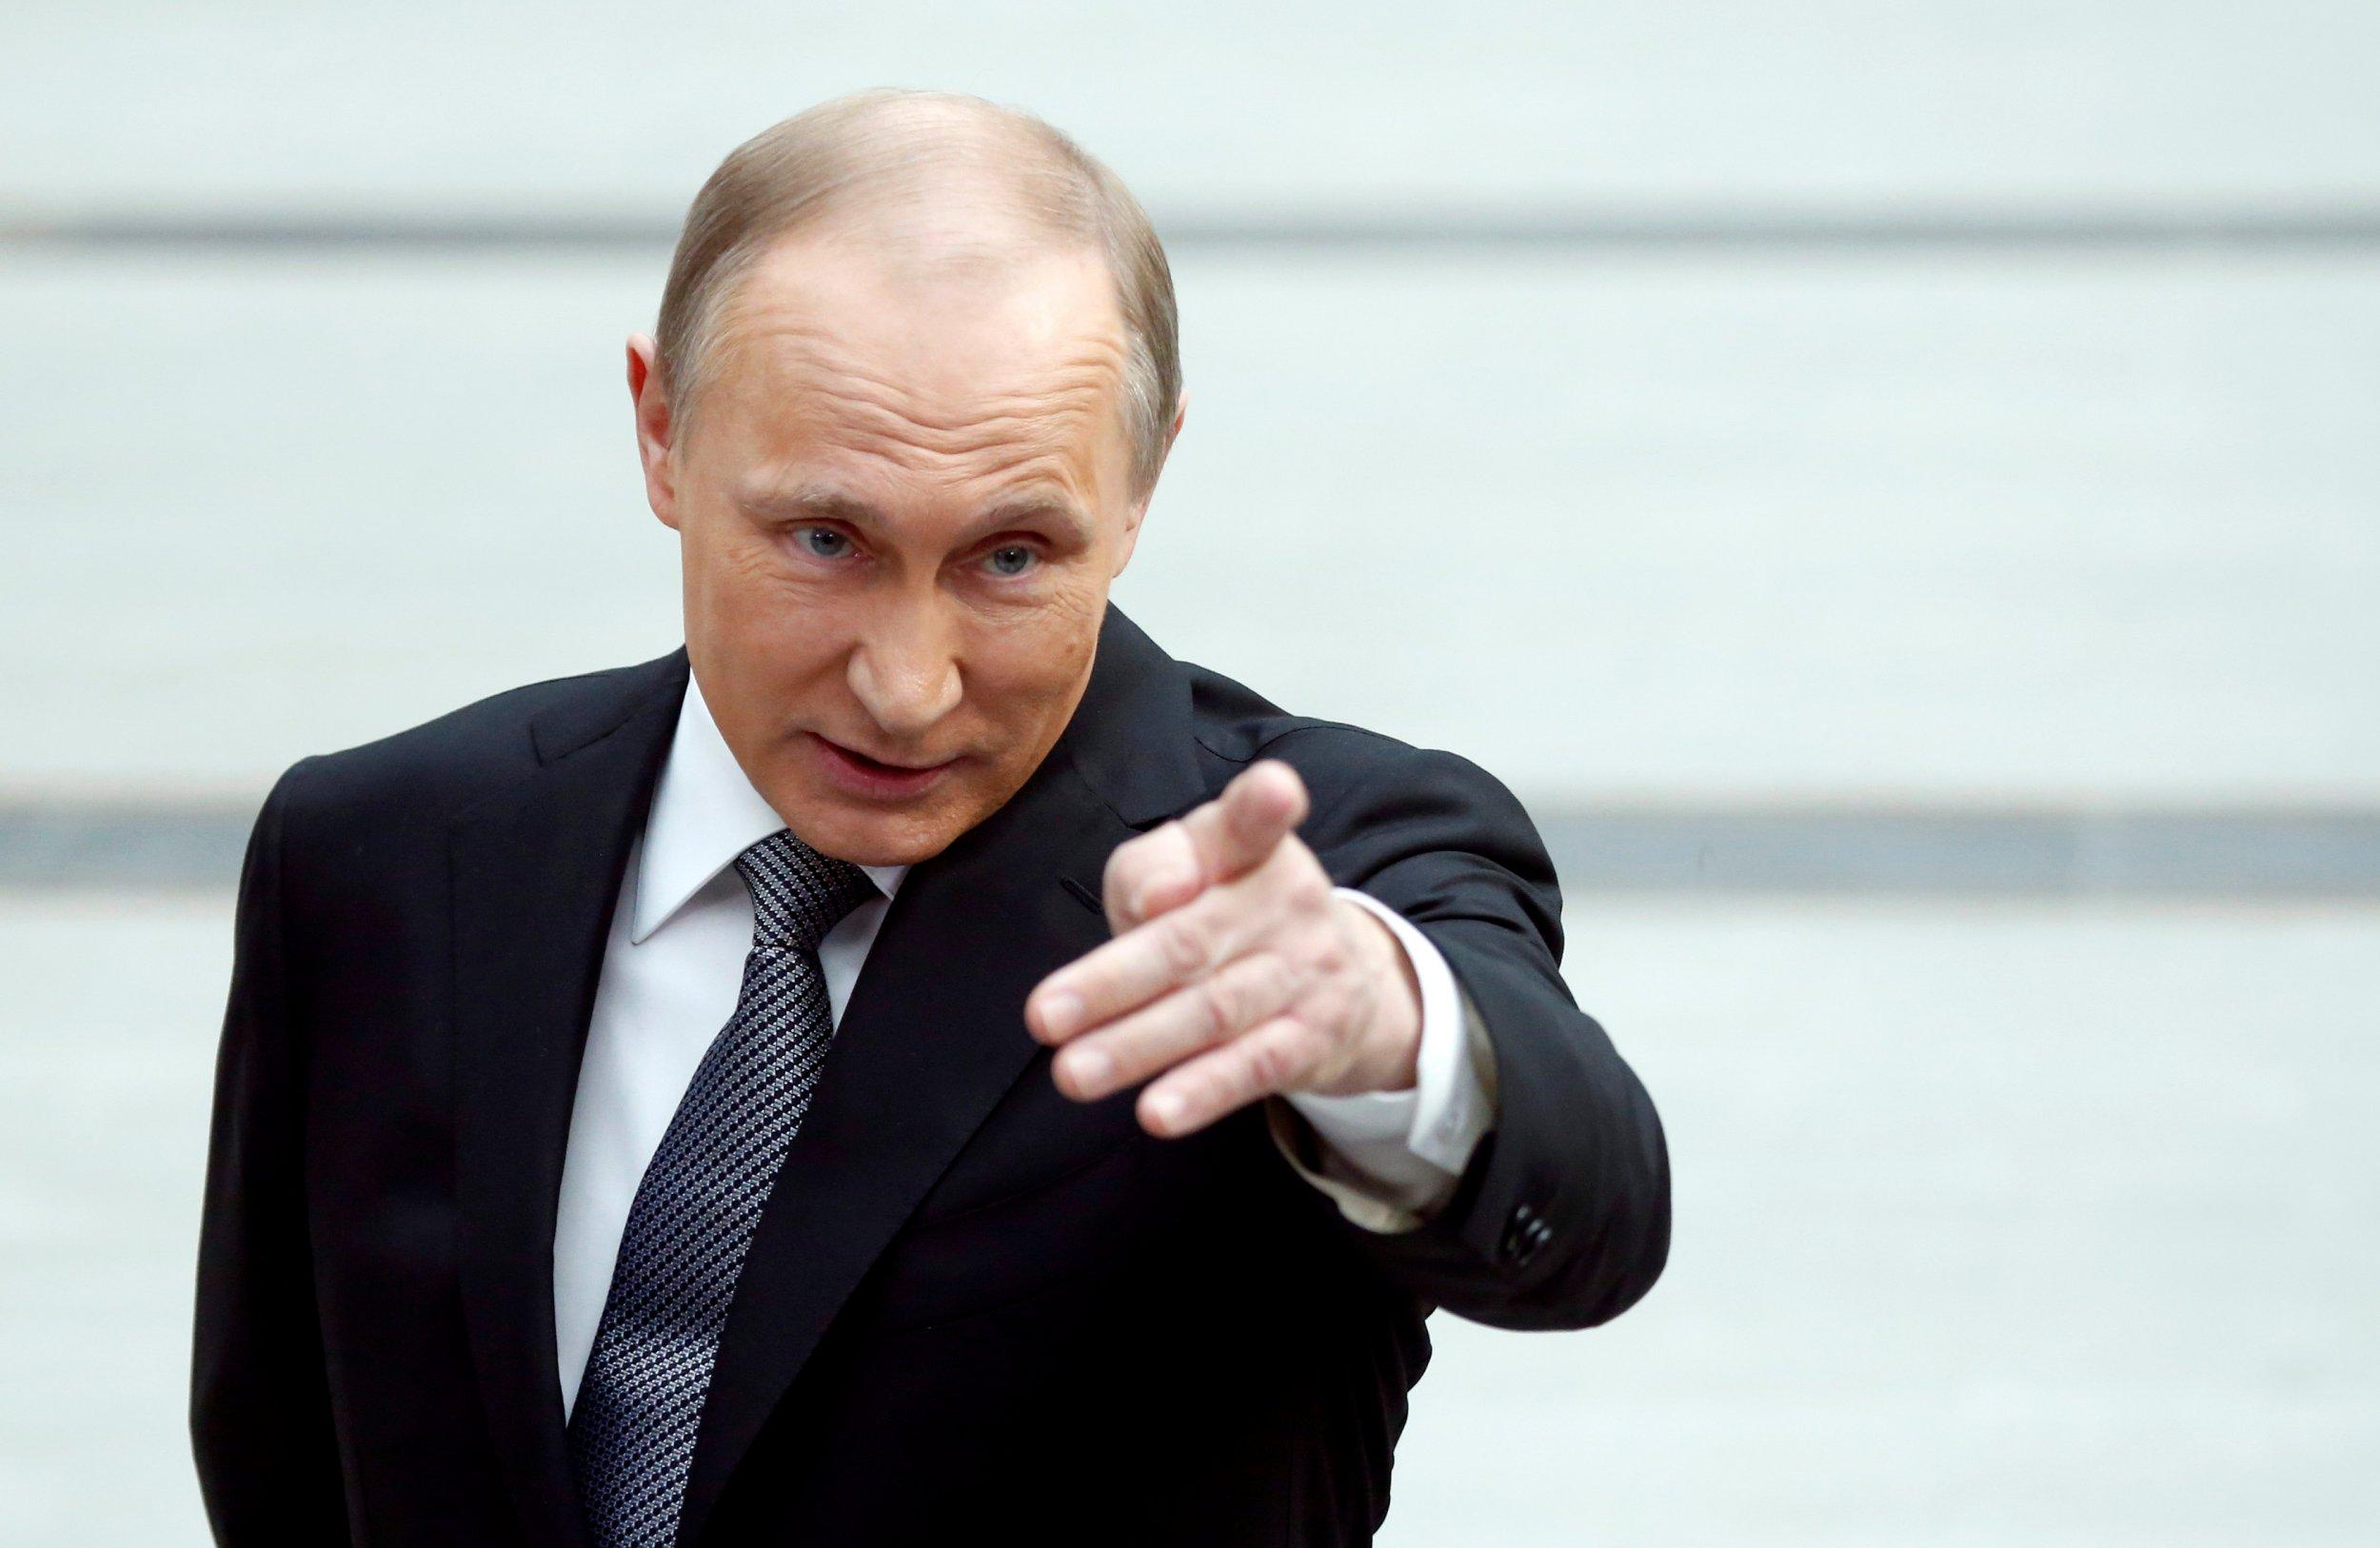 Putin gestures